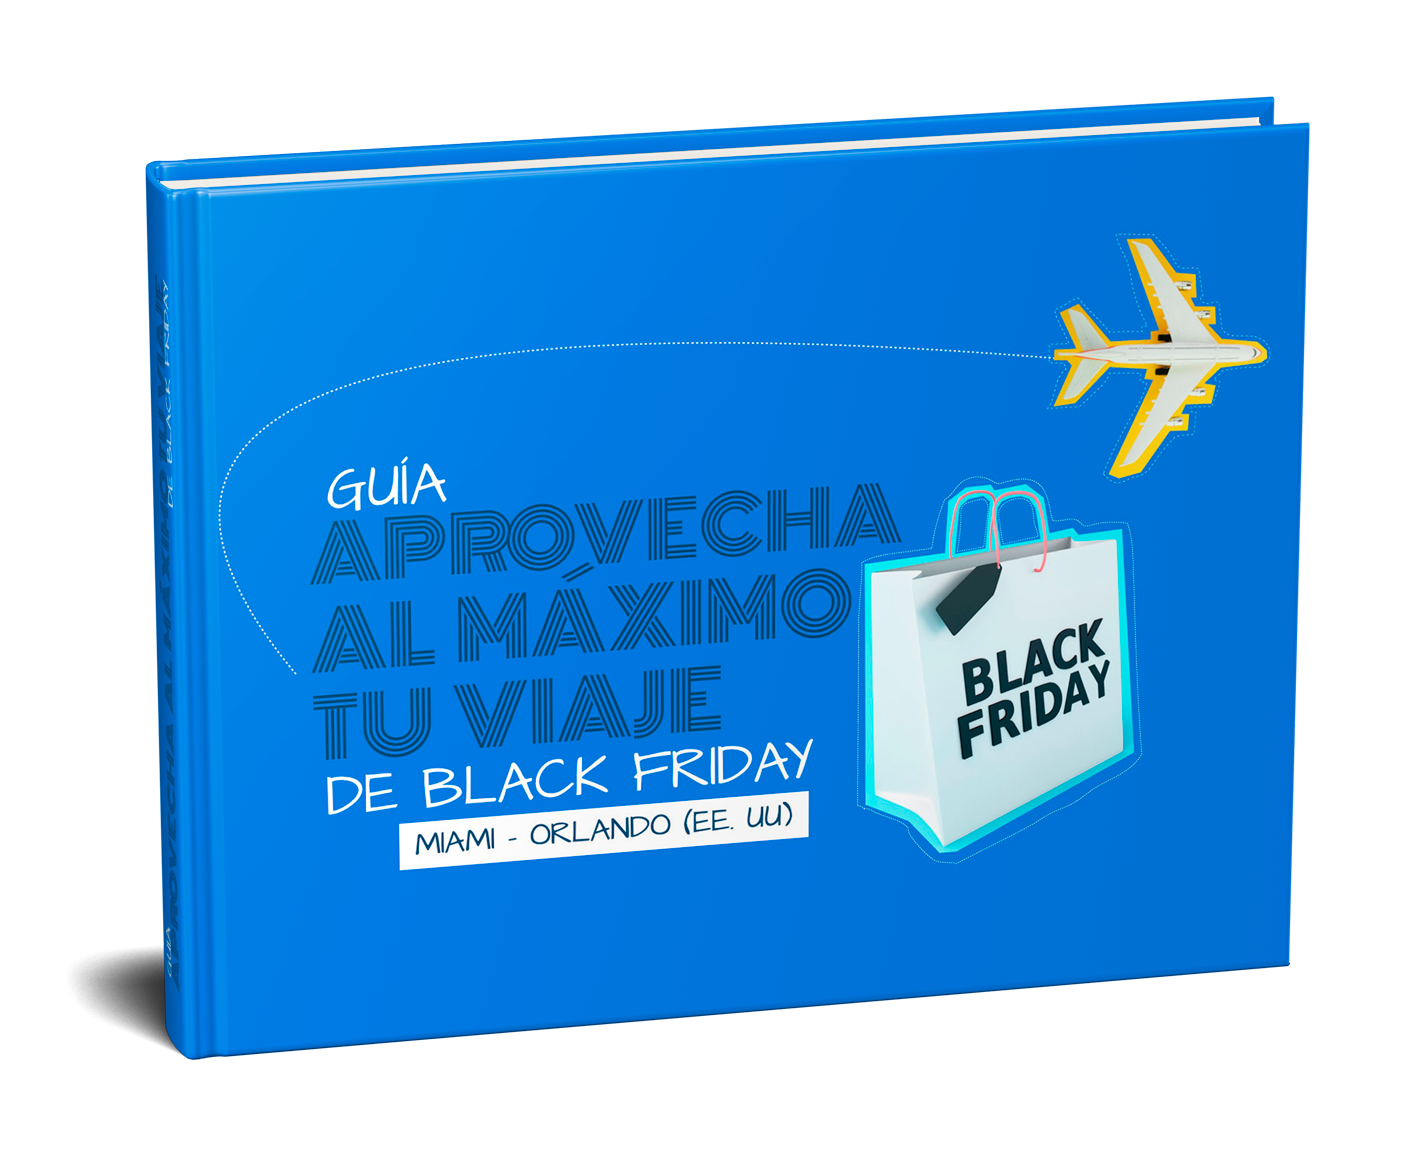 guia-viaje-black-friday.png